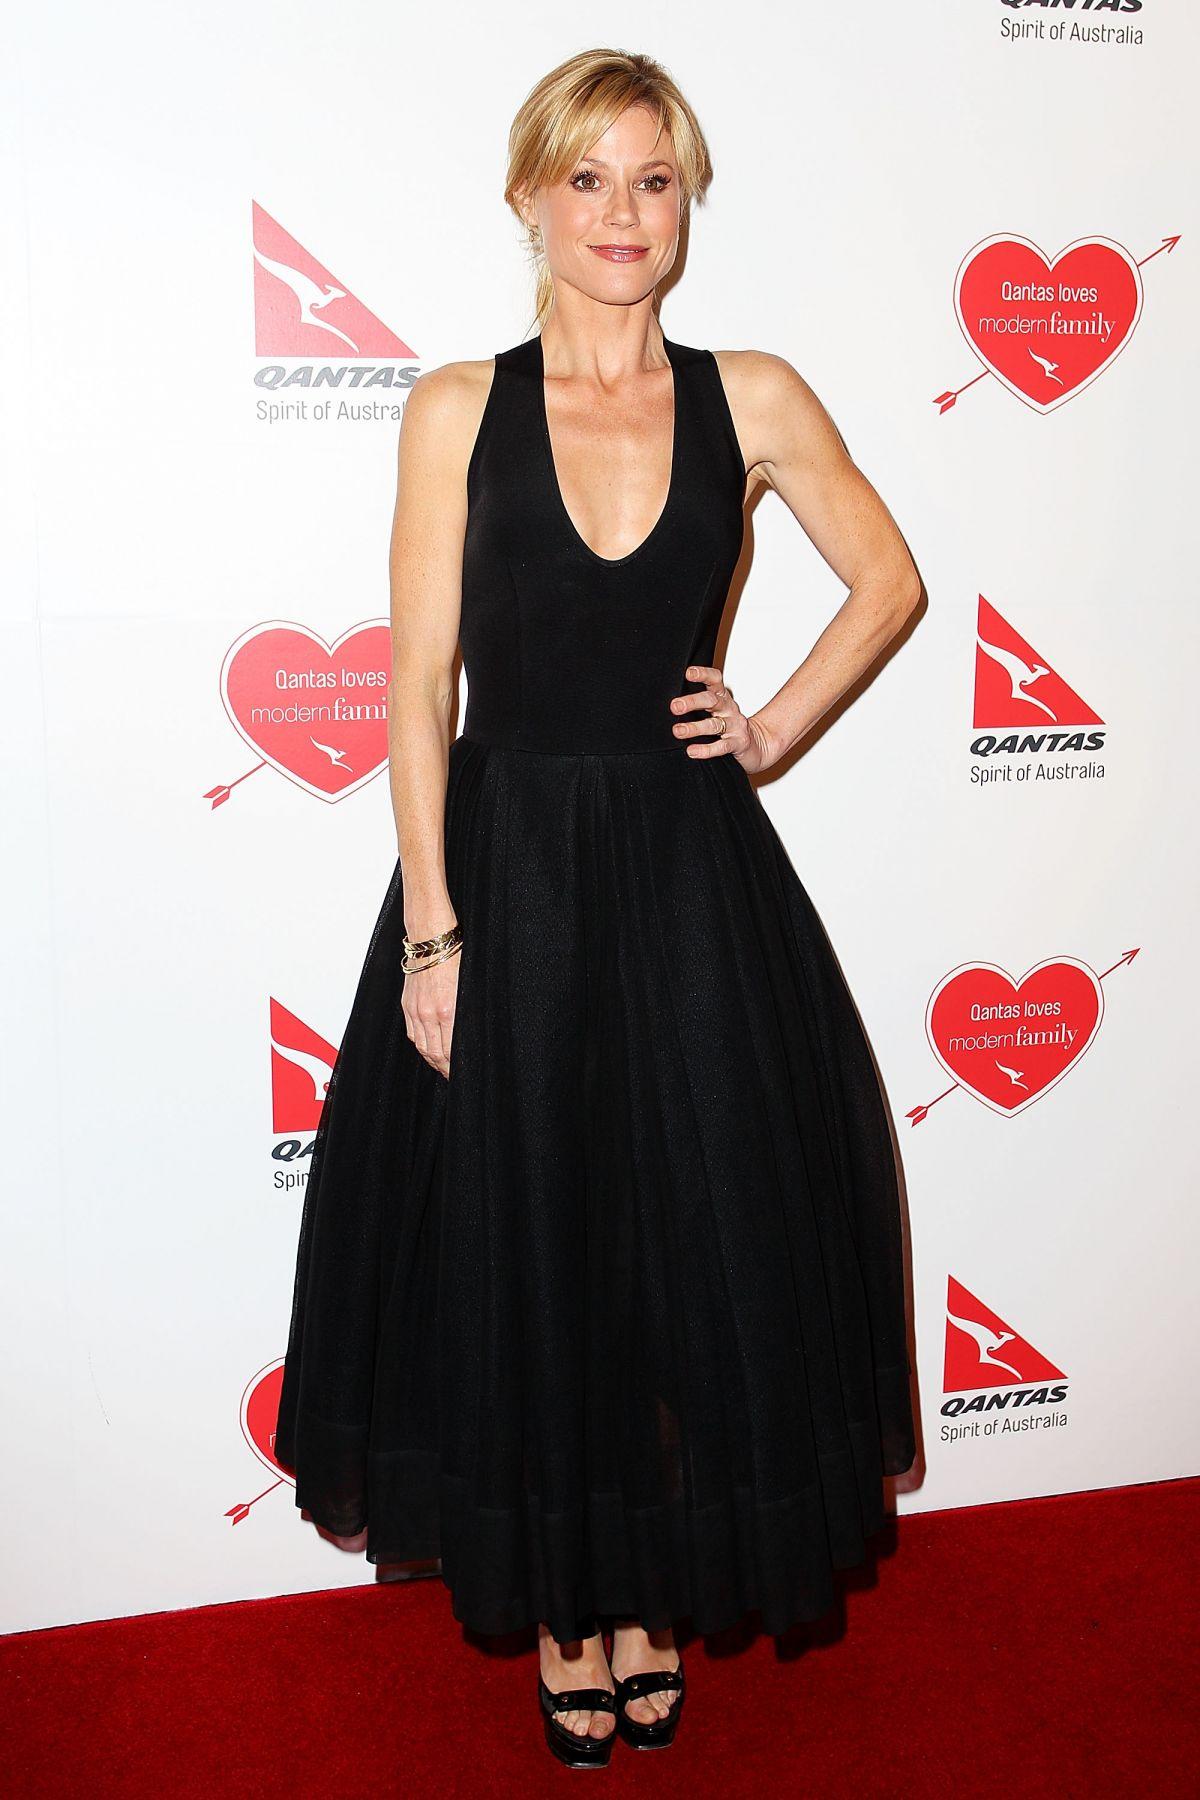 Julie Bowen   julie Bowen   Julie bowen, Women, Modern family